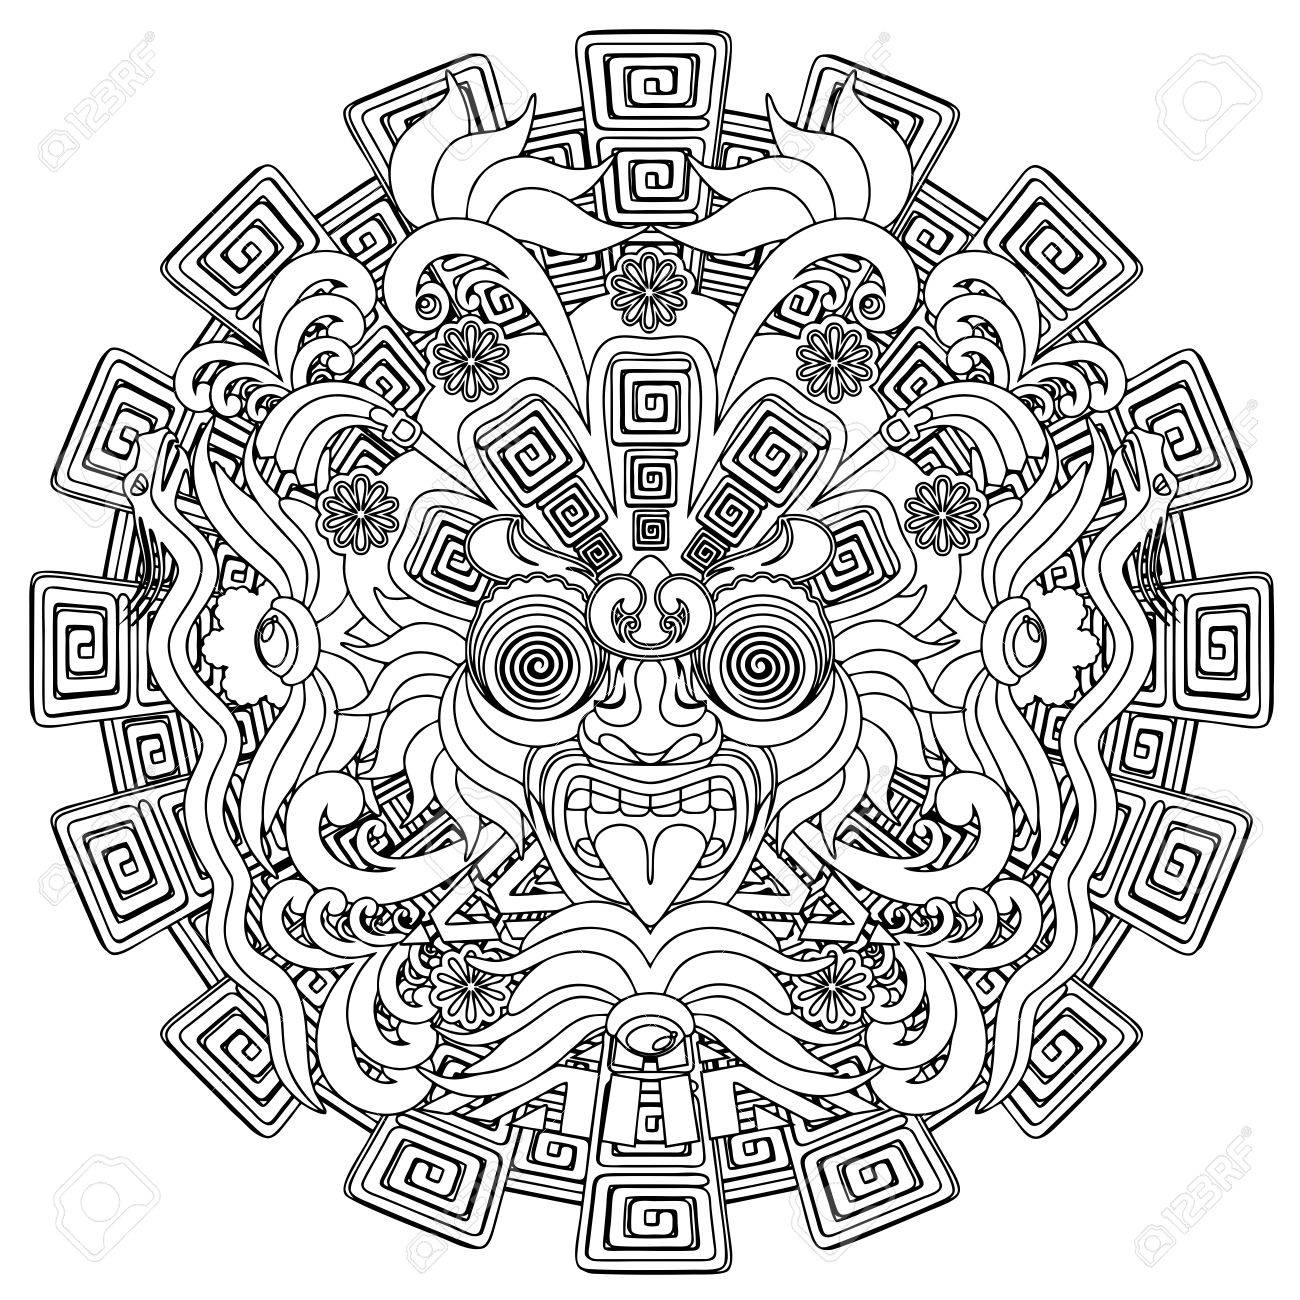 1300x1300 Aztec Warrior Mask Black Stroke Doodle Royalty Free Cliparts